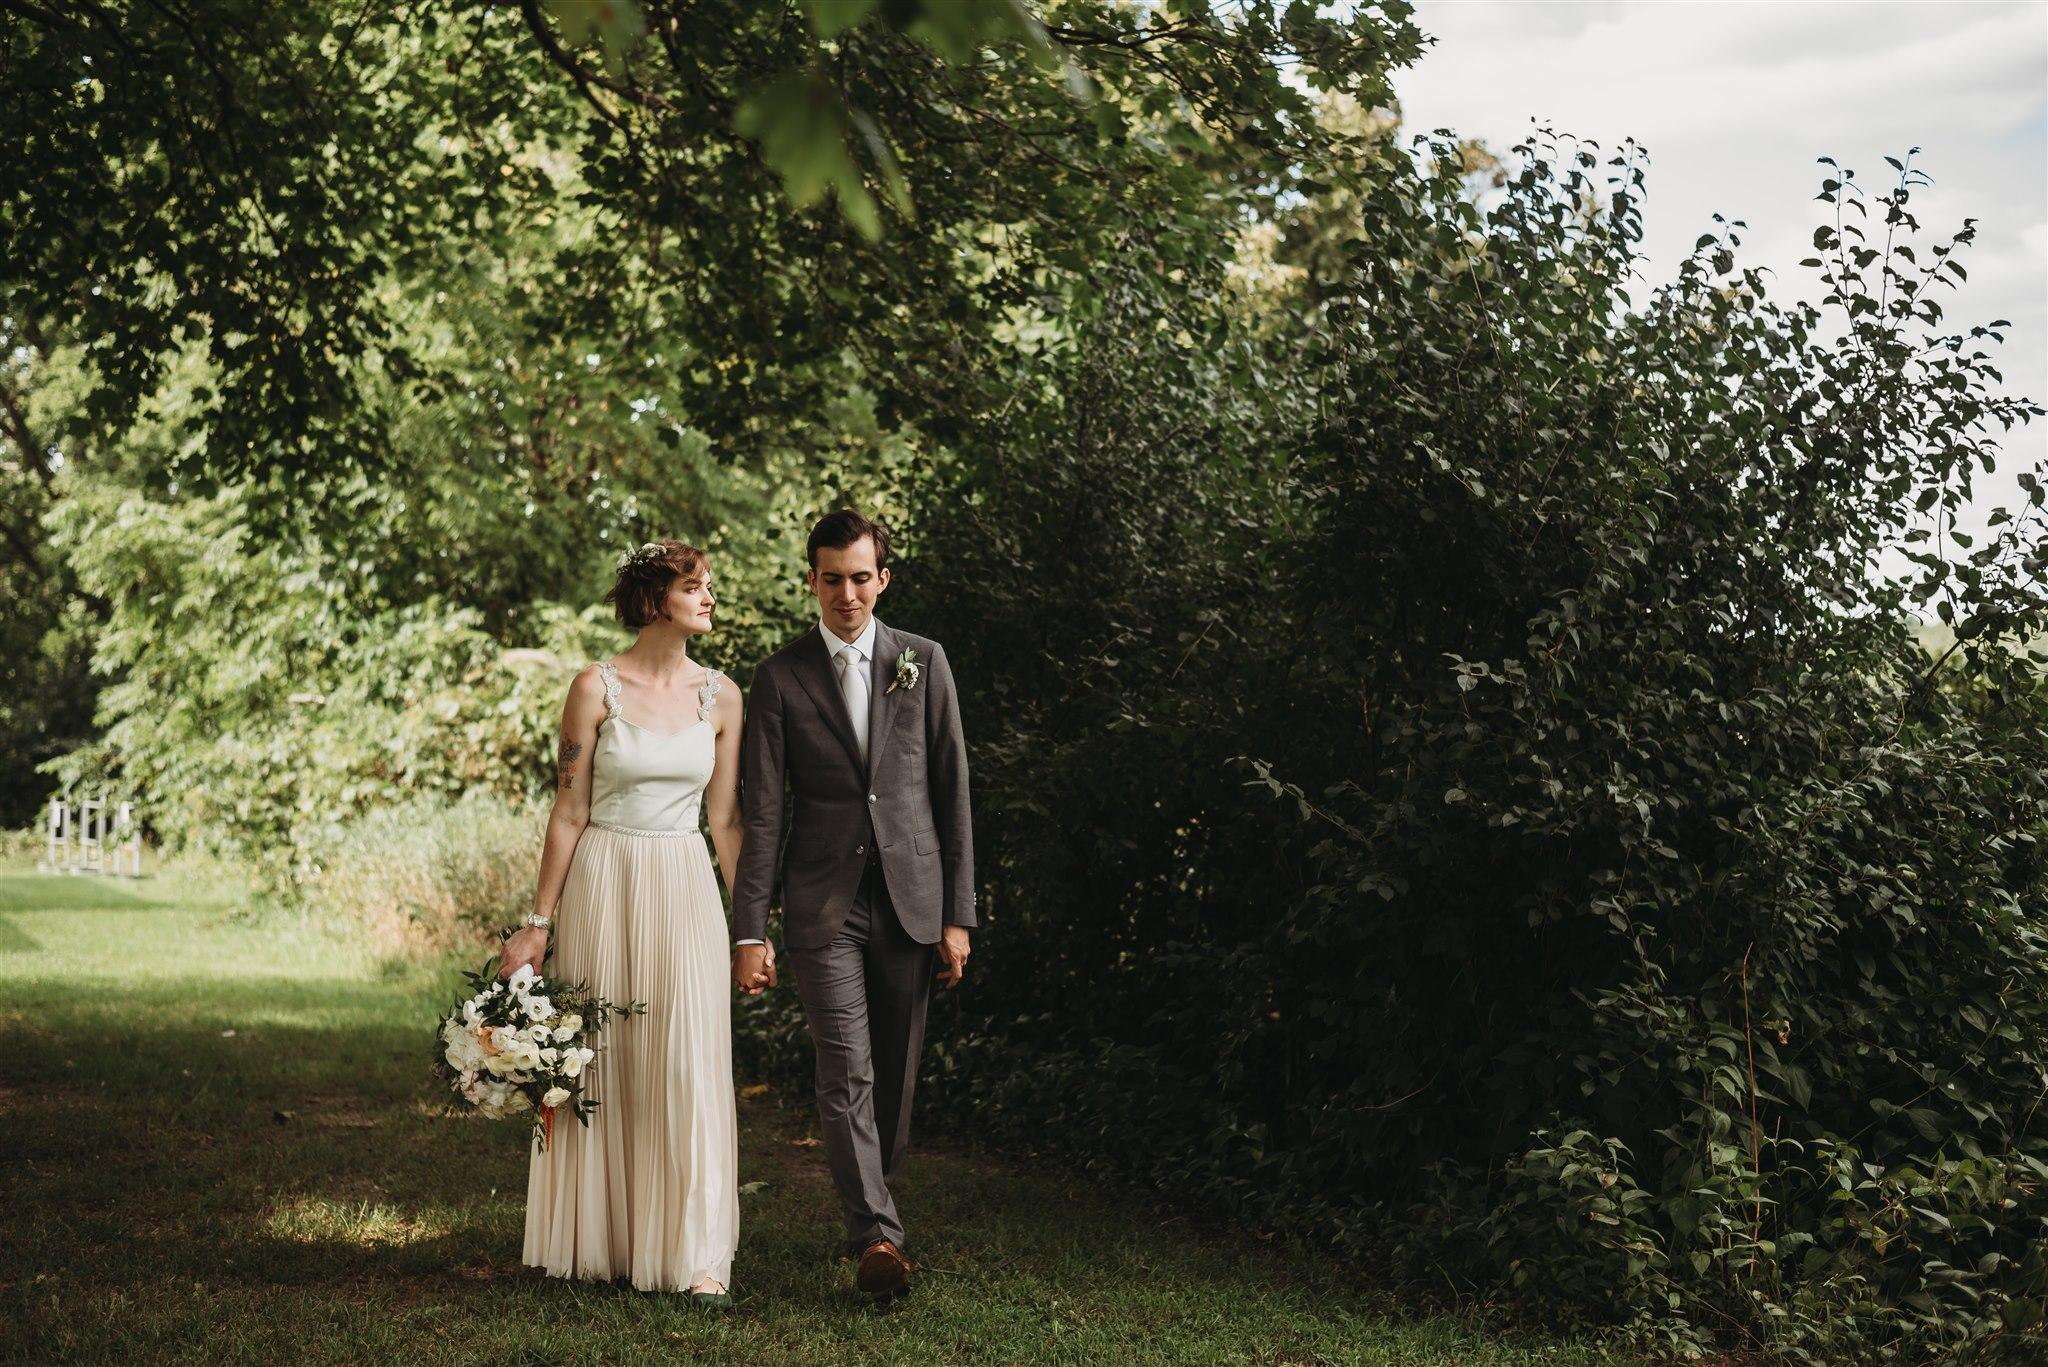 fanshawe conservation area wedding photos 342 1 - Watson Porter Pavillion Wedding